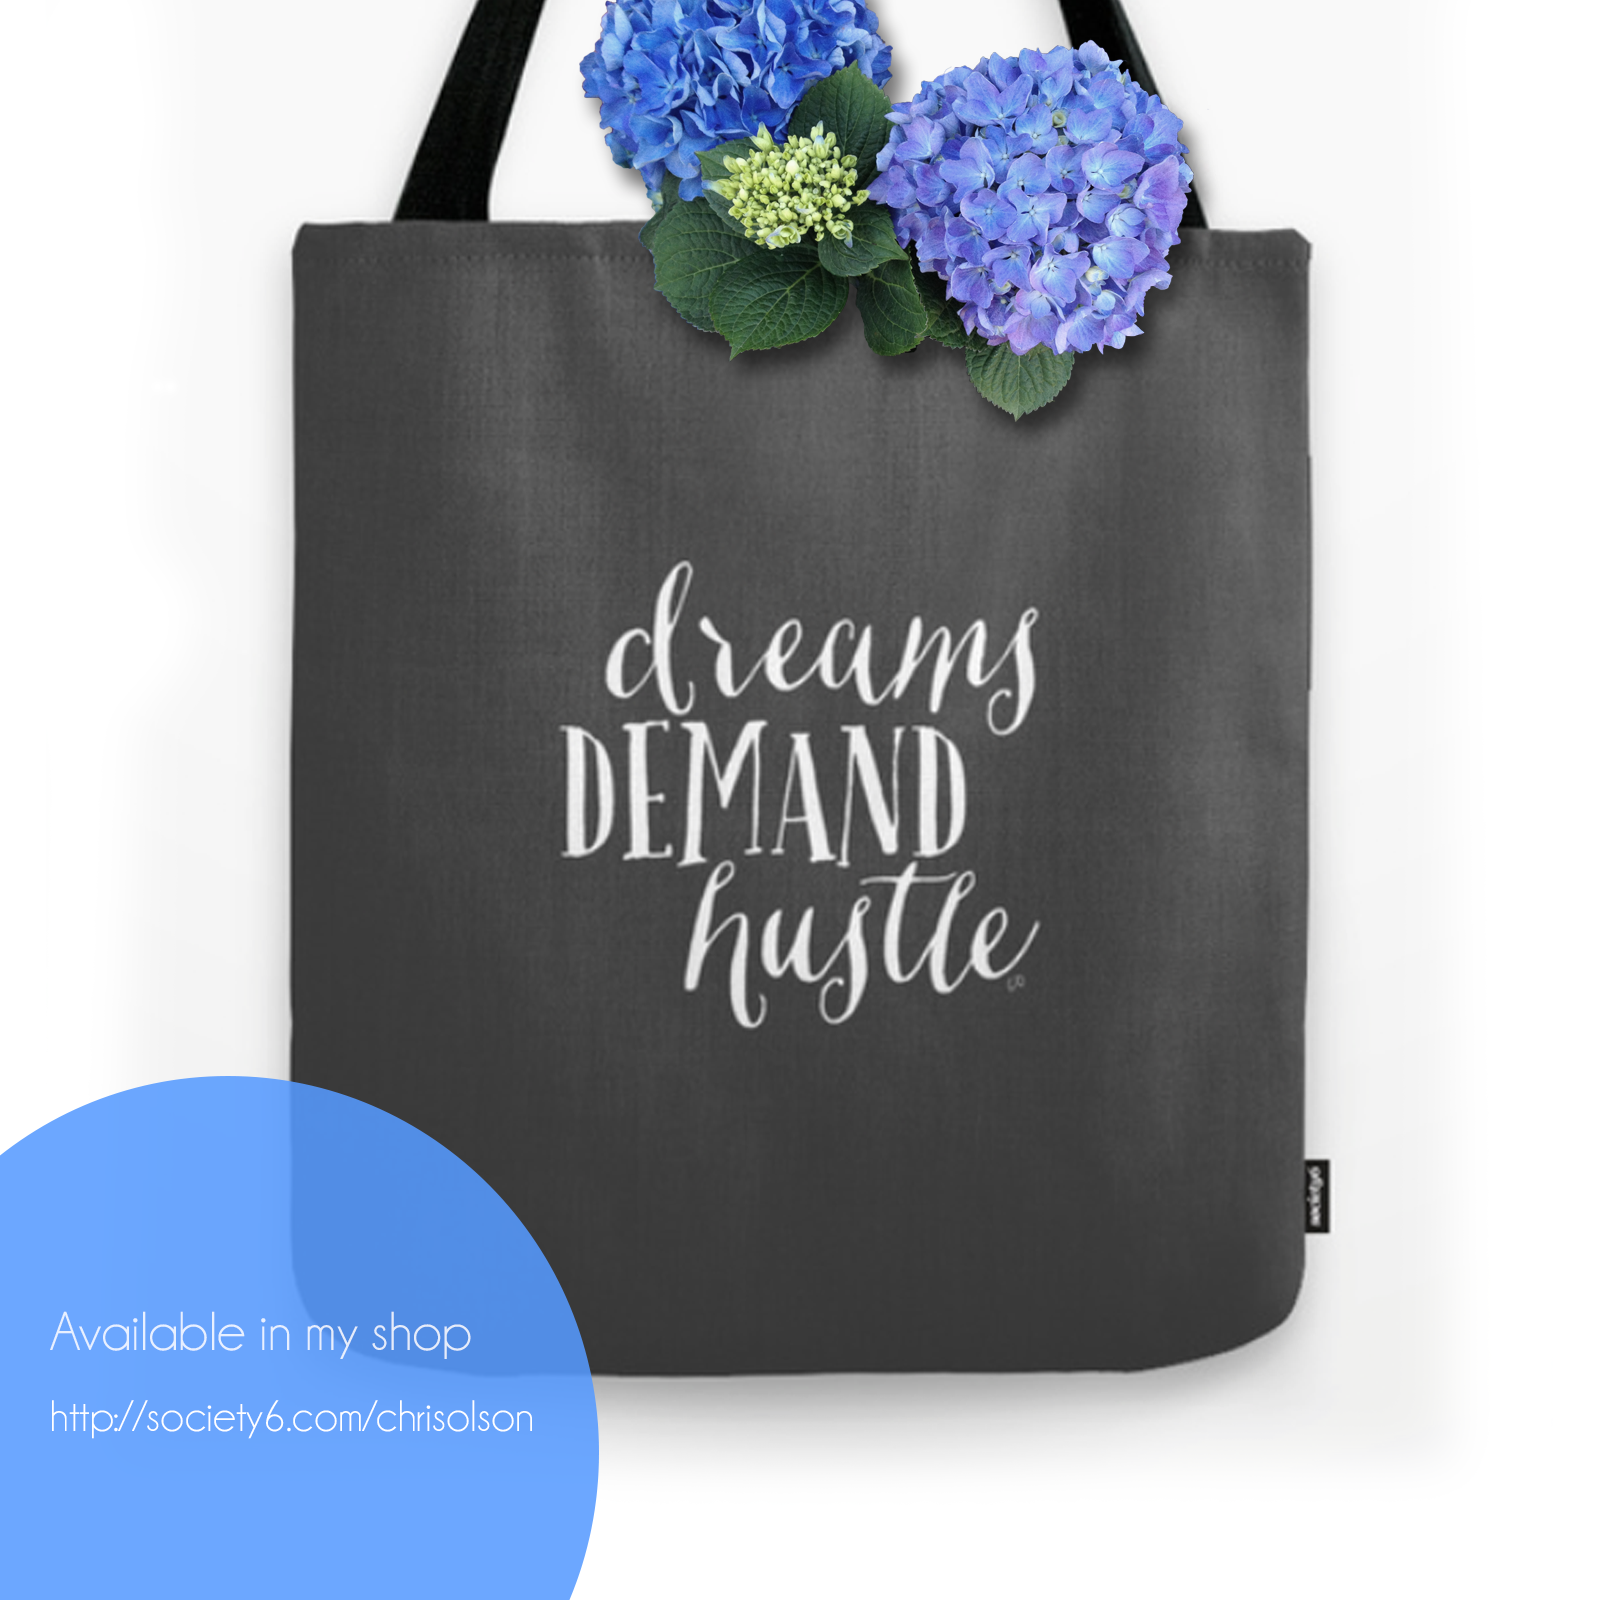 Dreams demand hustle tote bag